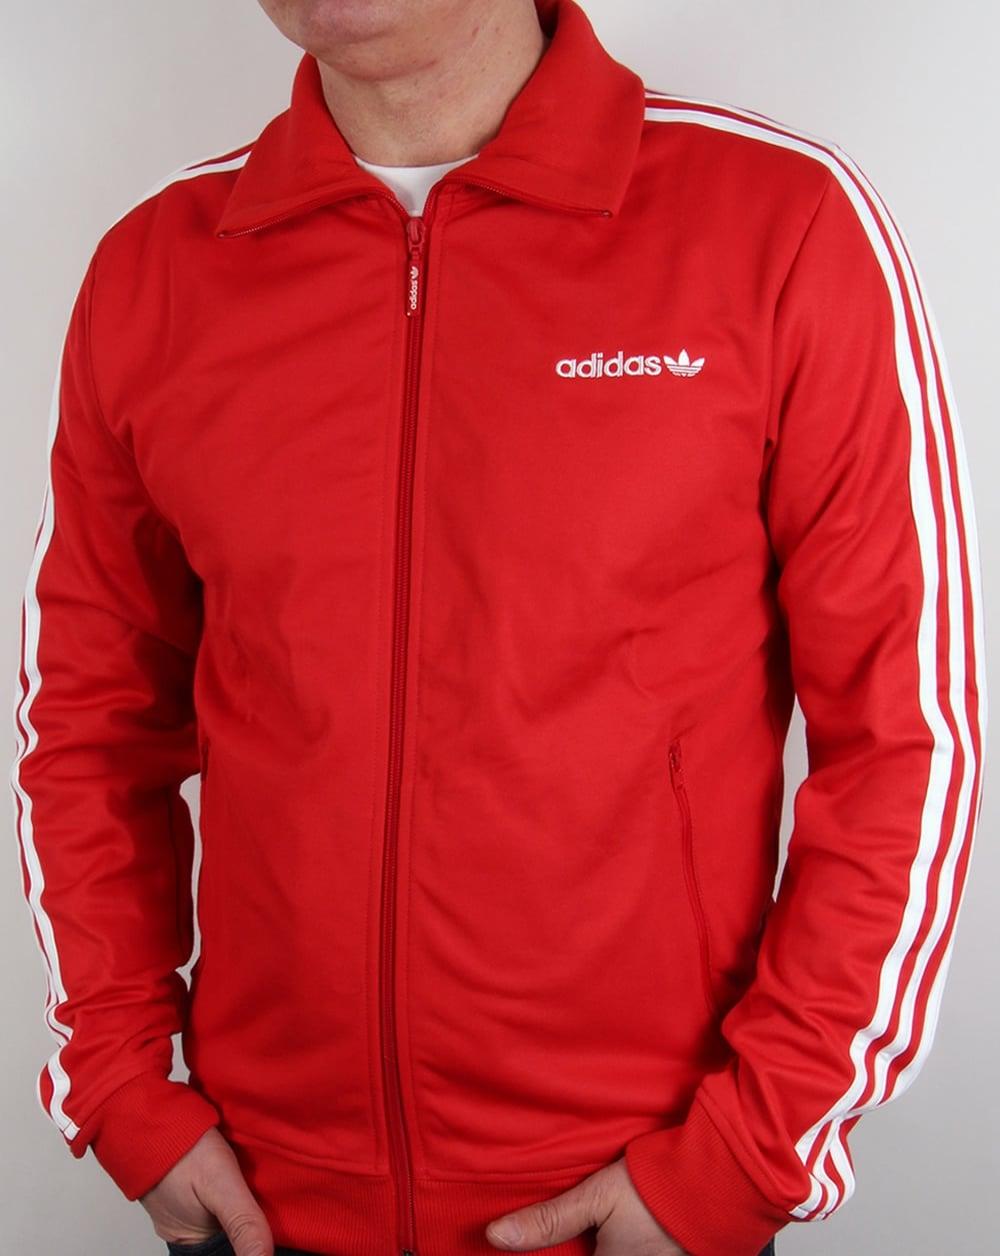 By Track Adidas Top Adidas Originals Originals lcT1J3uFK